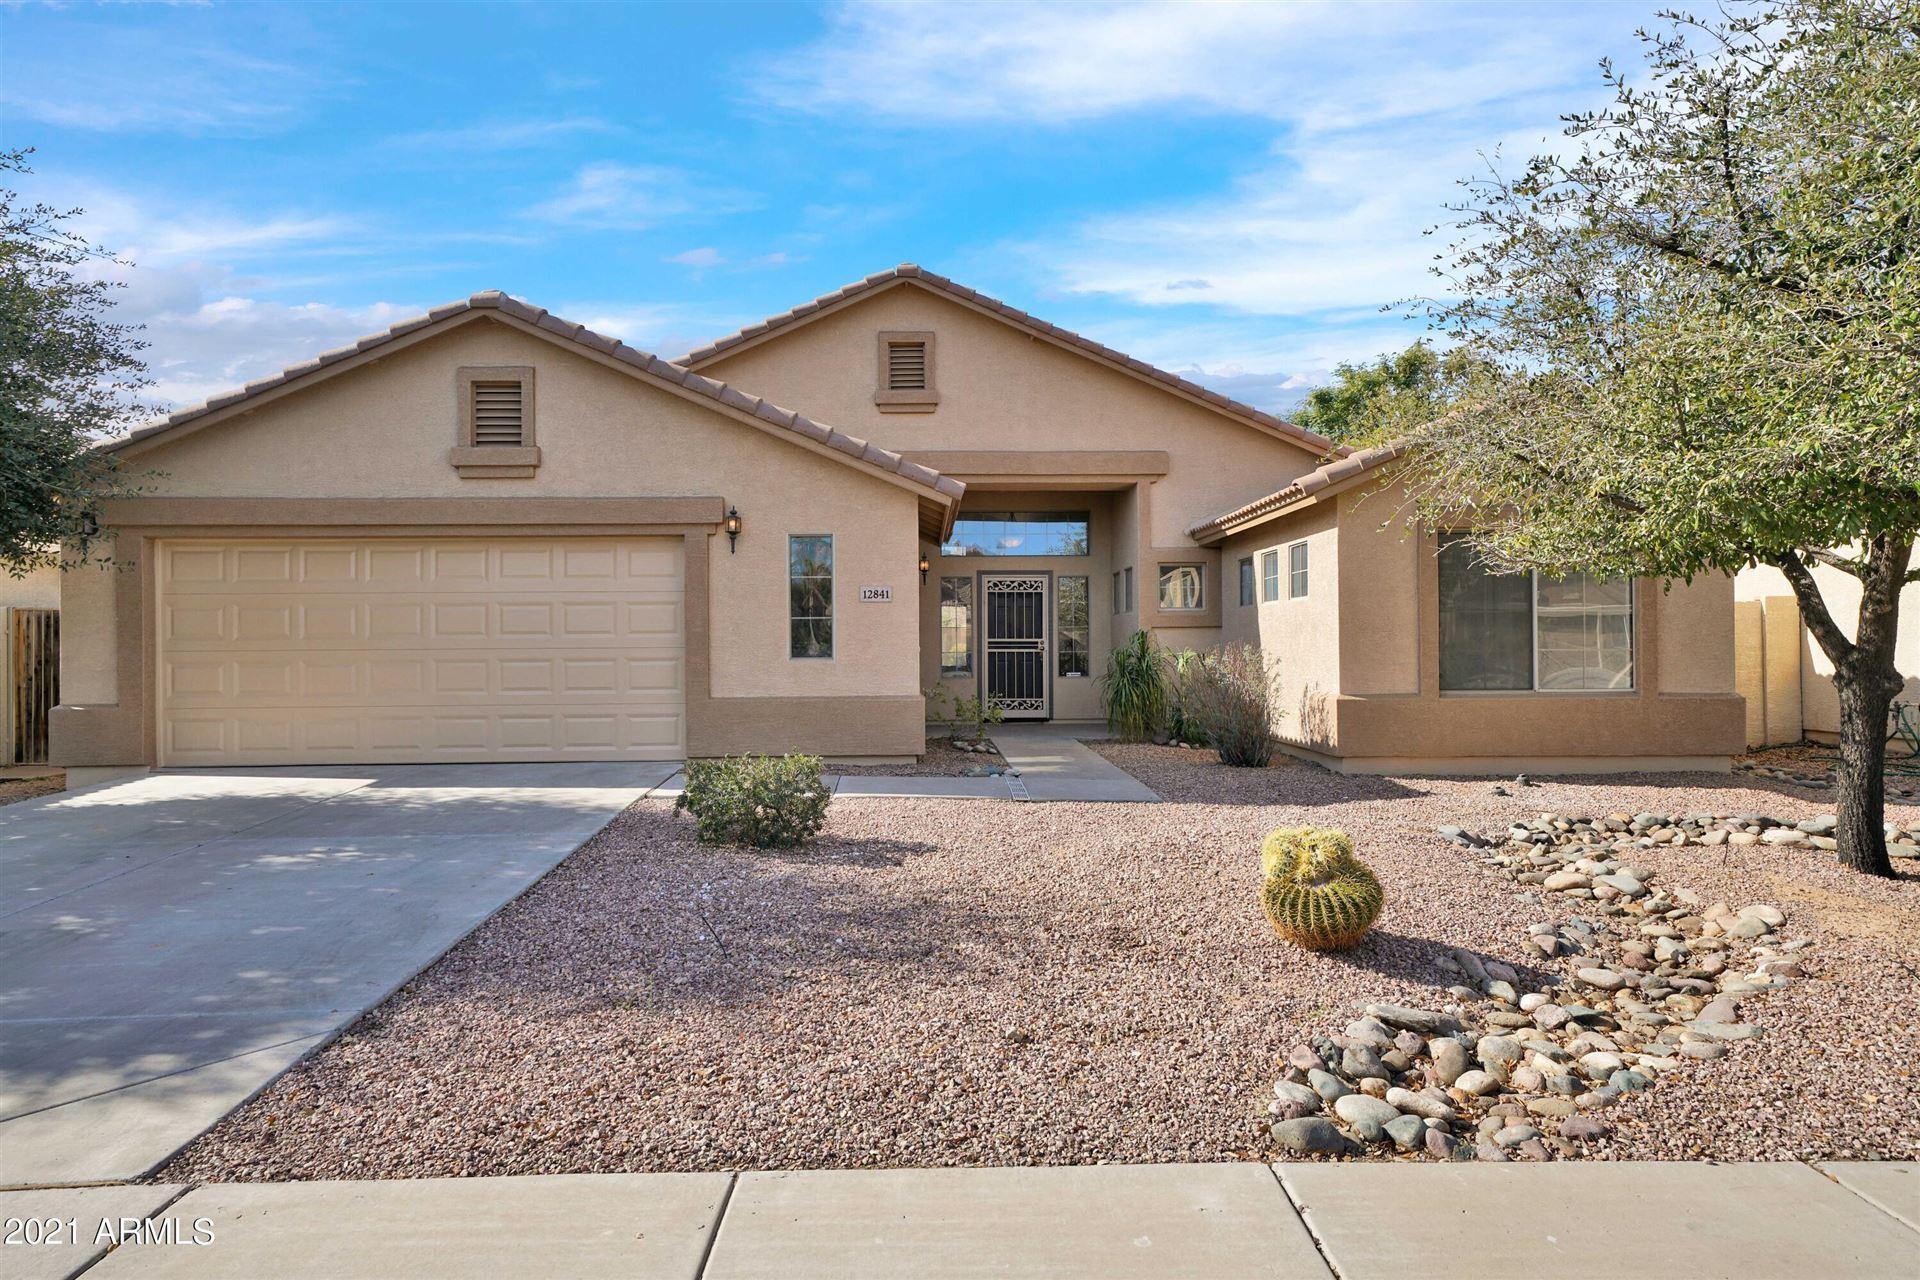 Photo of 12841 W CORRINE Drive, El Mirage, AZ 85335 (MLS # 6201903)